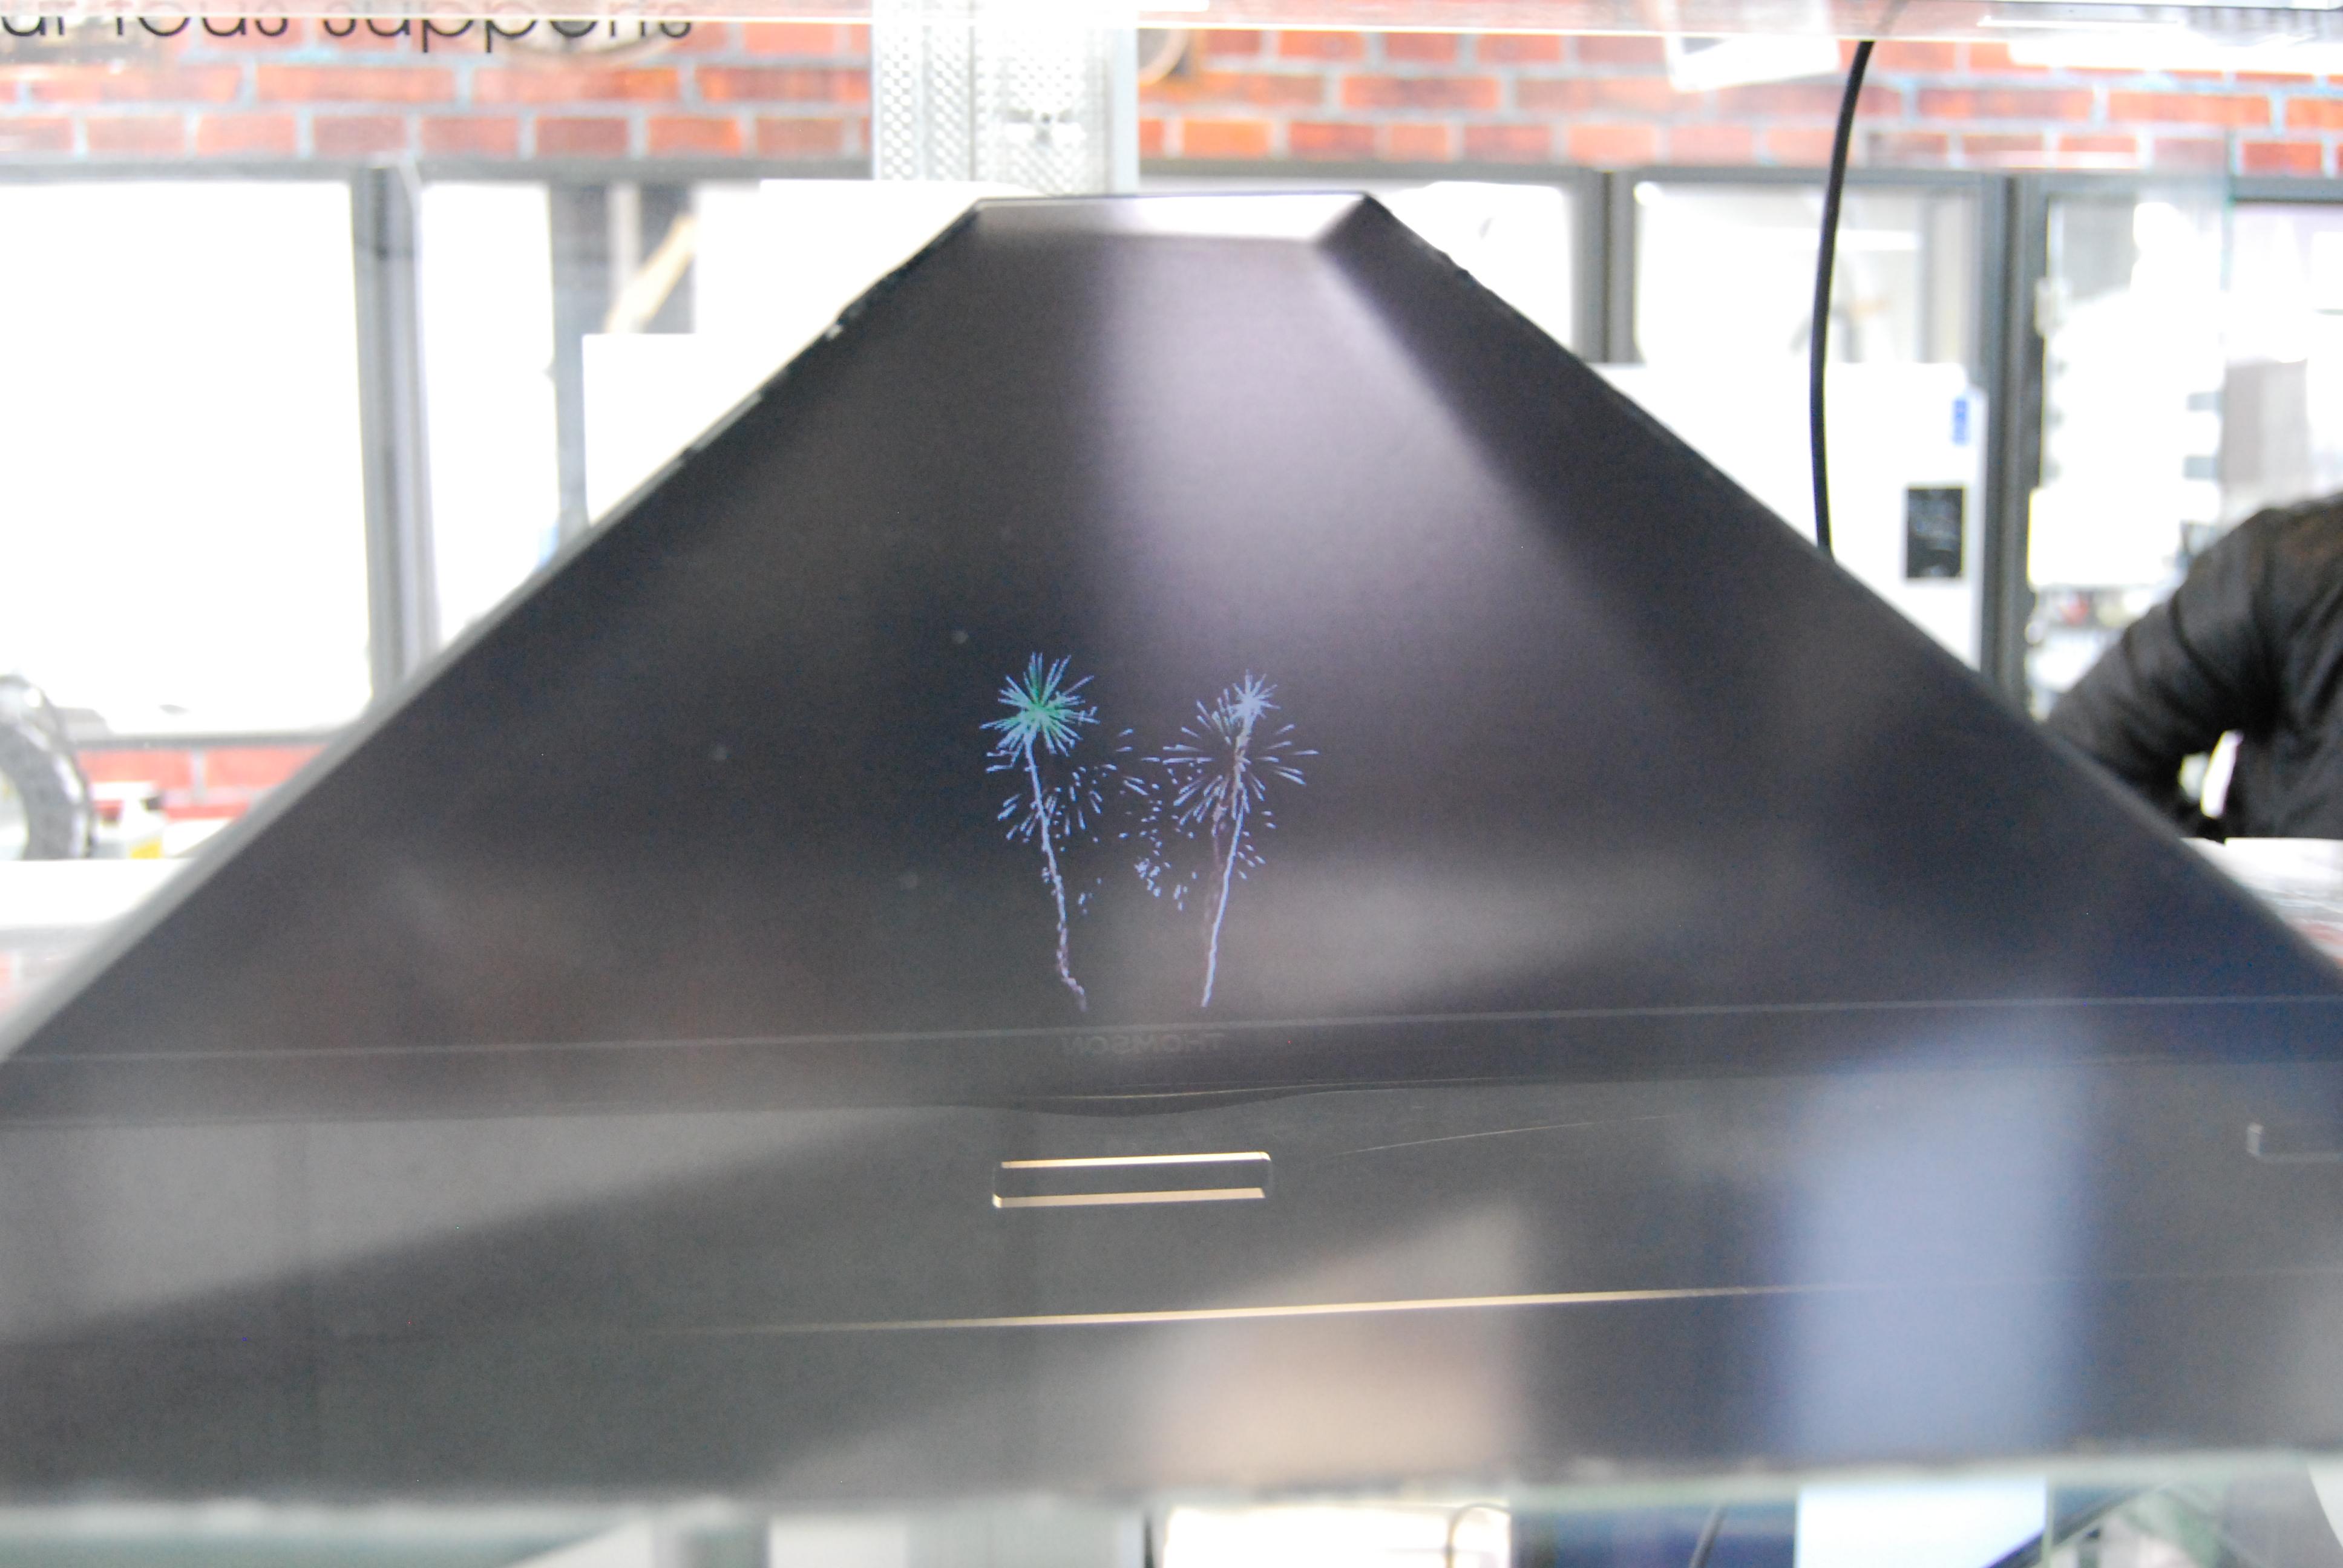 Hologramme - Baylon-Villard